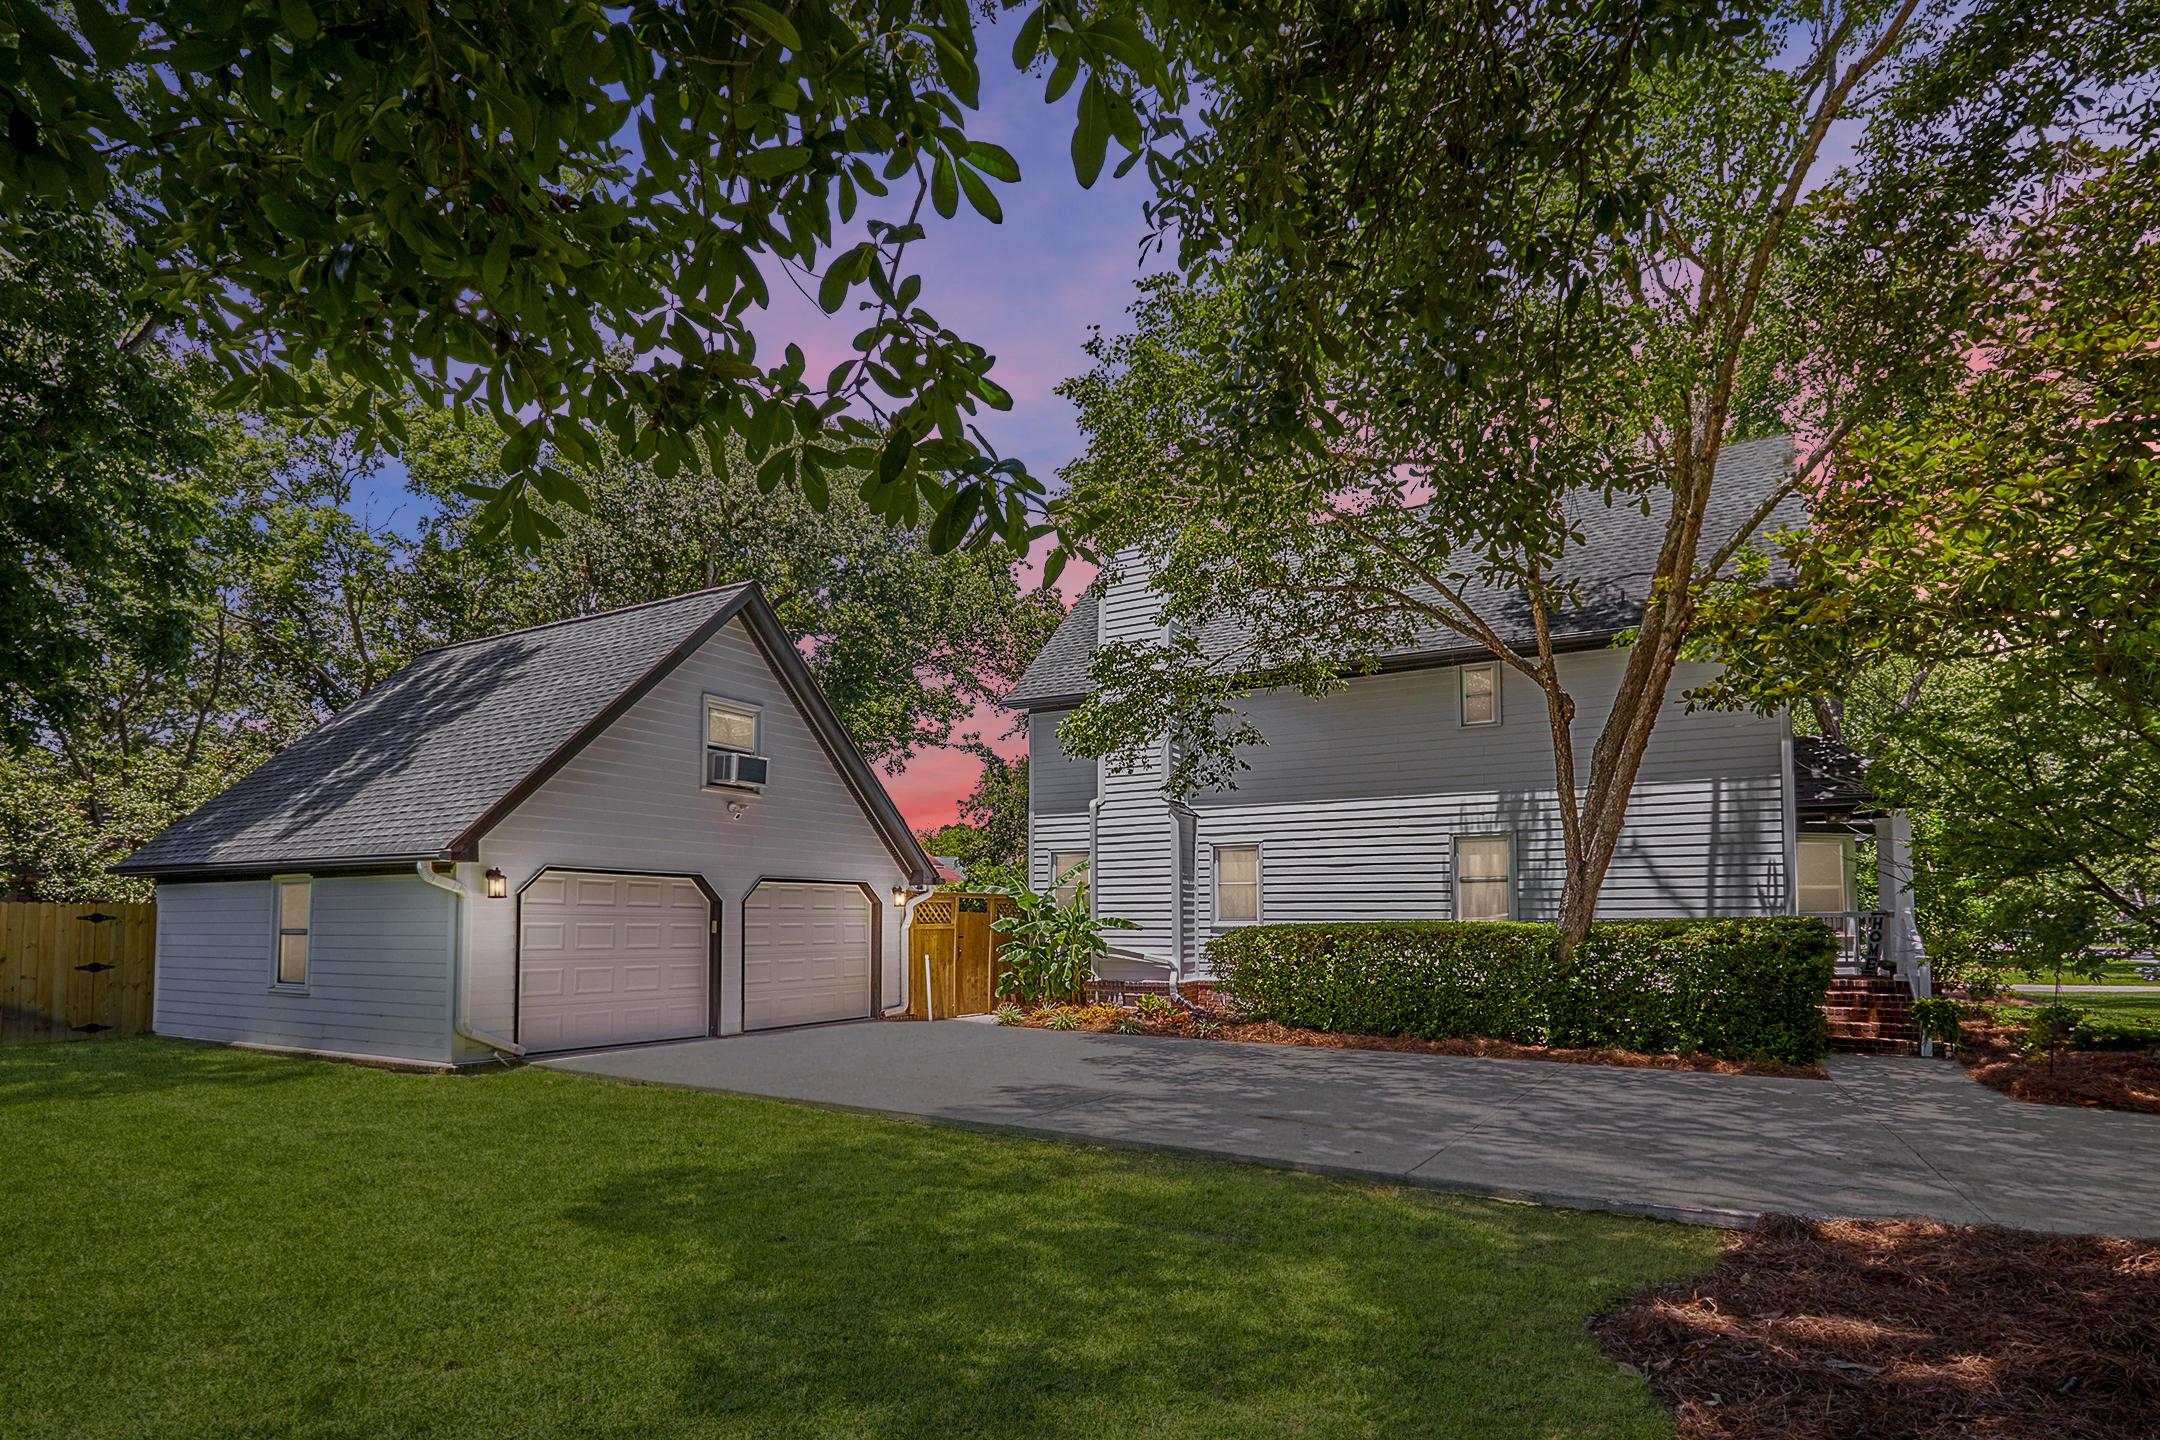 Stiles Point Plantation Homes For Sale - 699 Castle Pinckney, Charleston, SC - 4